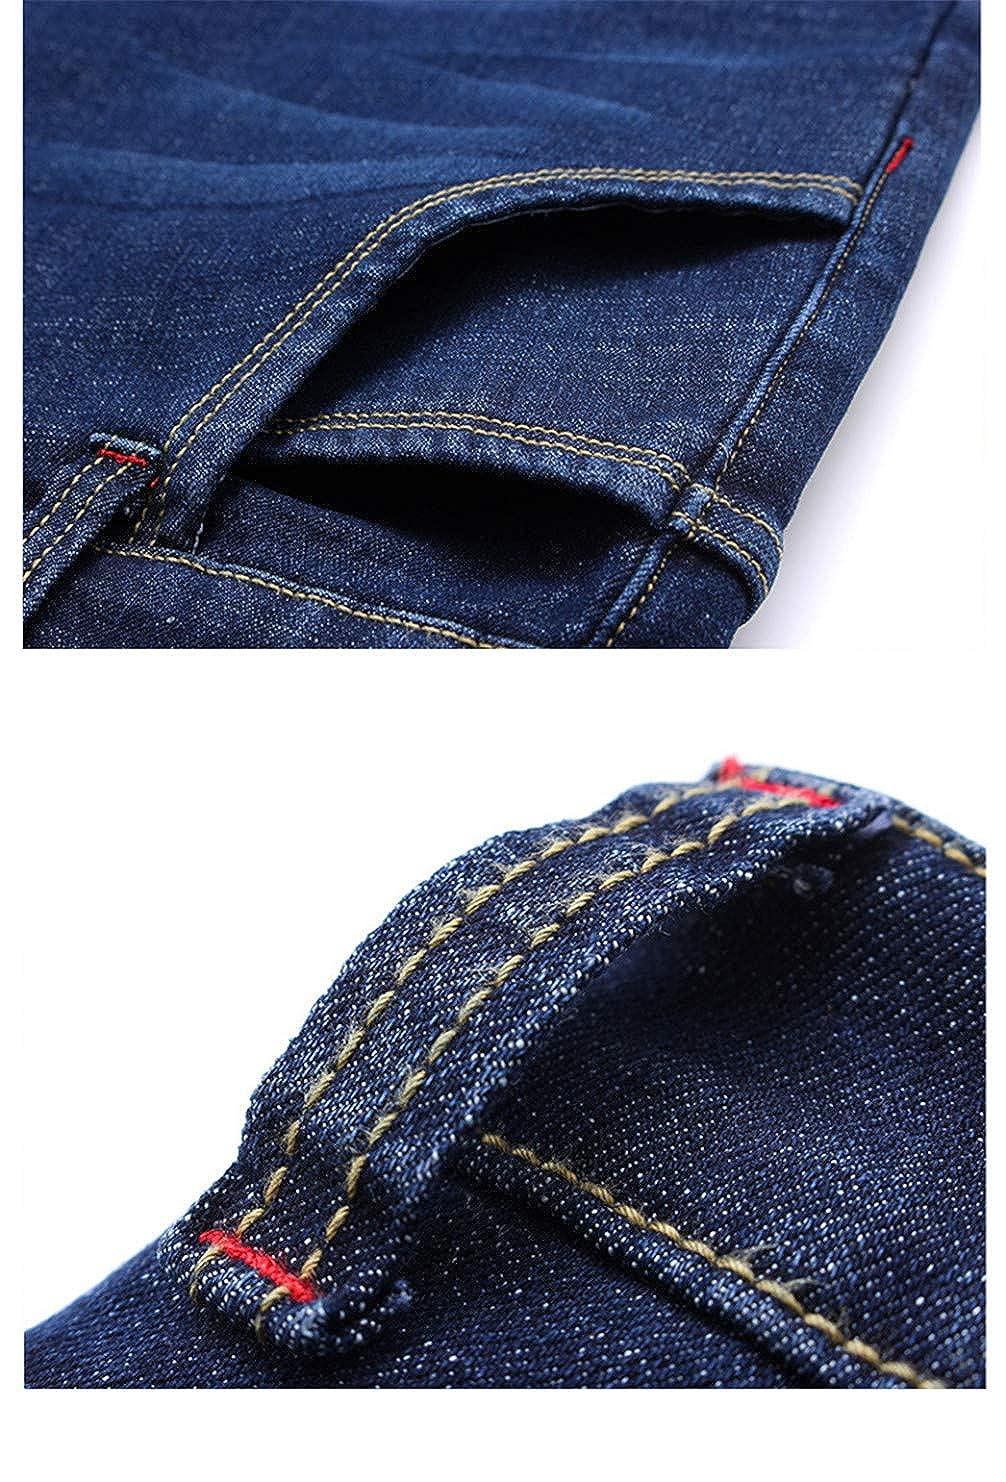 Winter Fleece Straight Stretch Business Casual Waist Classic Men Jeans